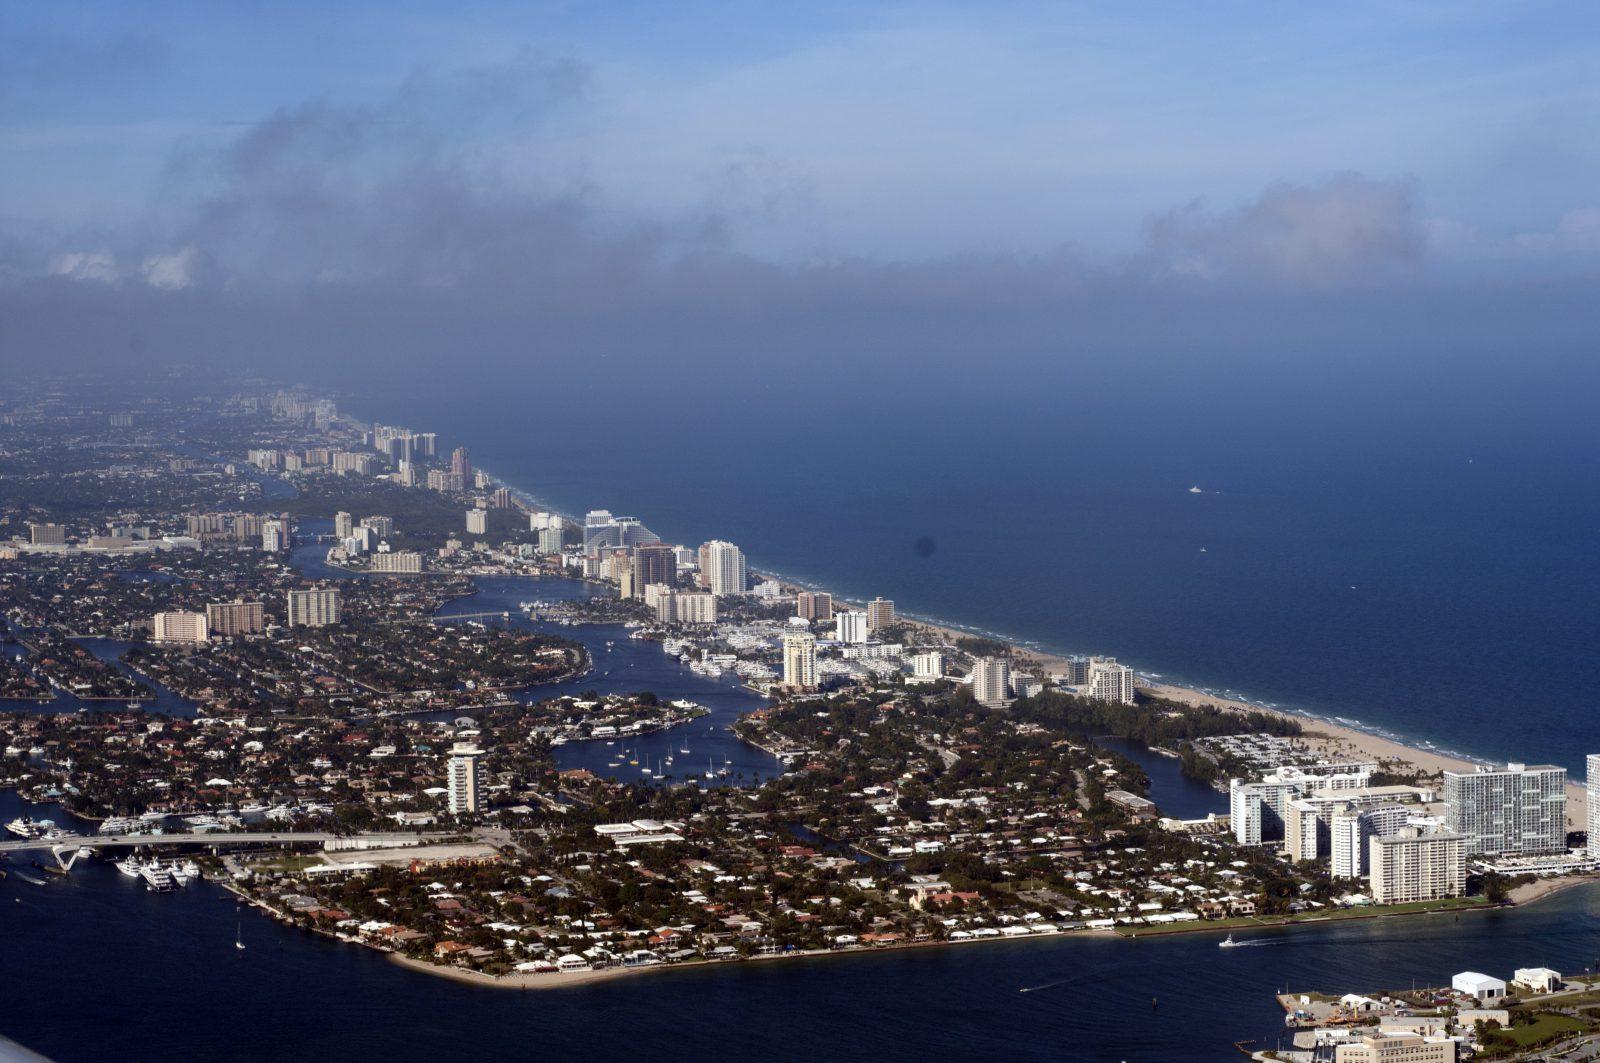 Fort Lauderdale CRA Management